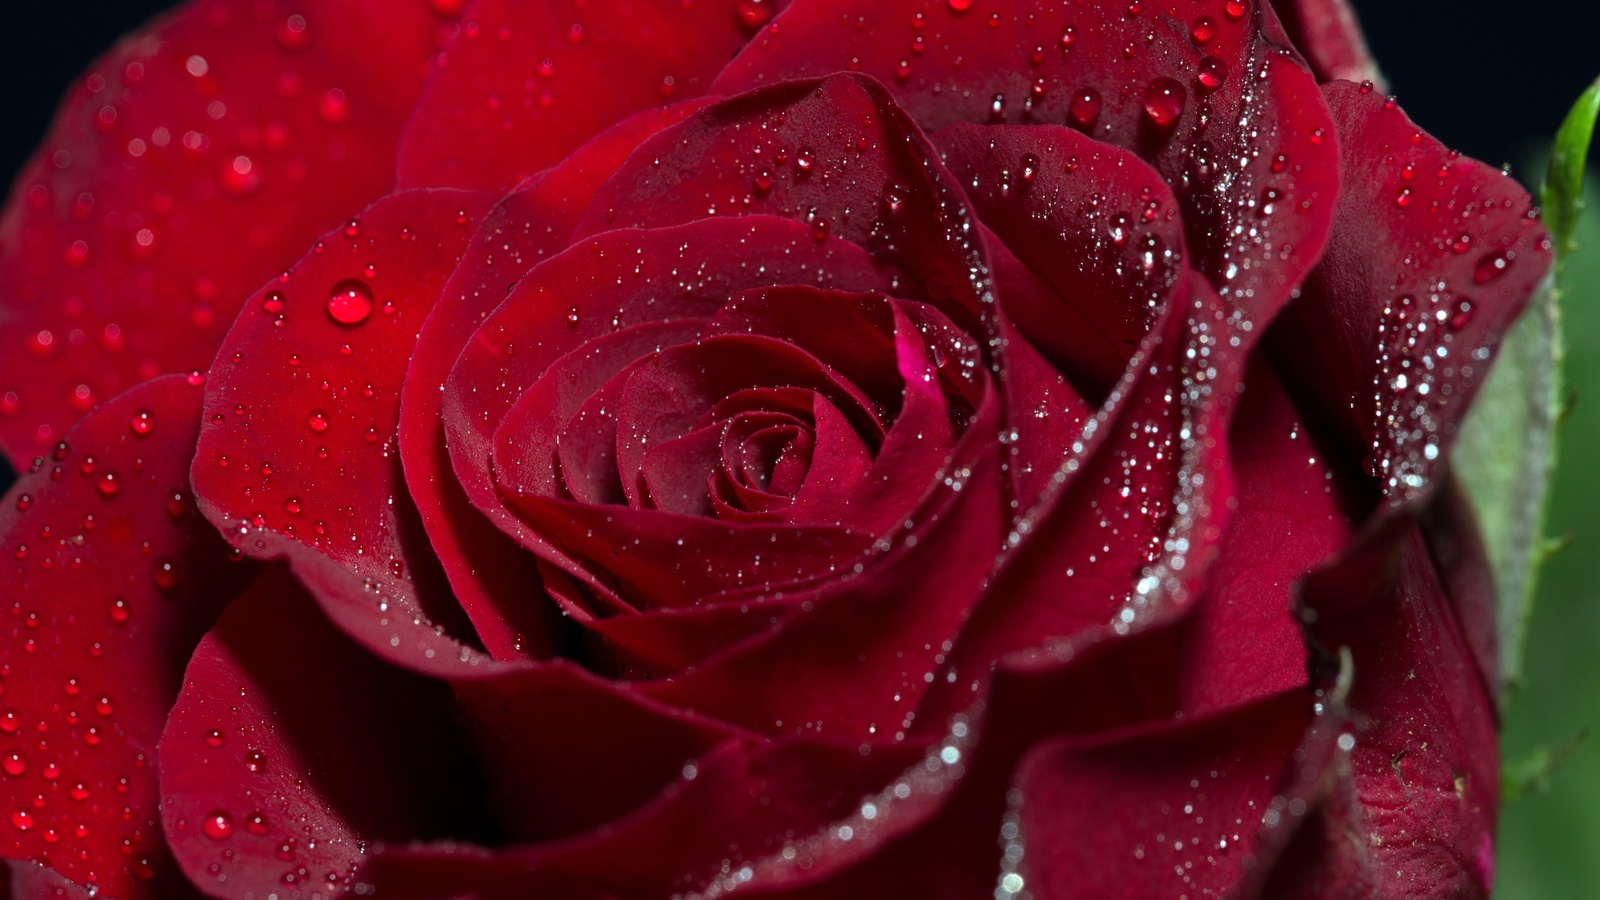 роза, цветок, лепестки, капли